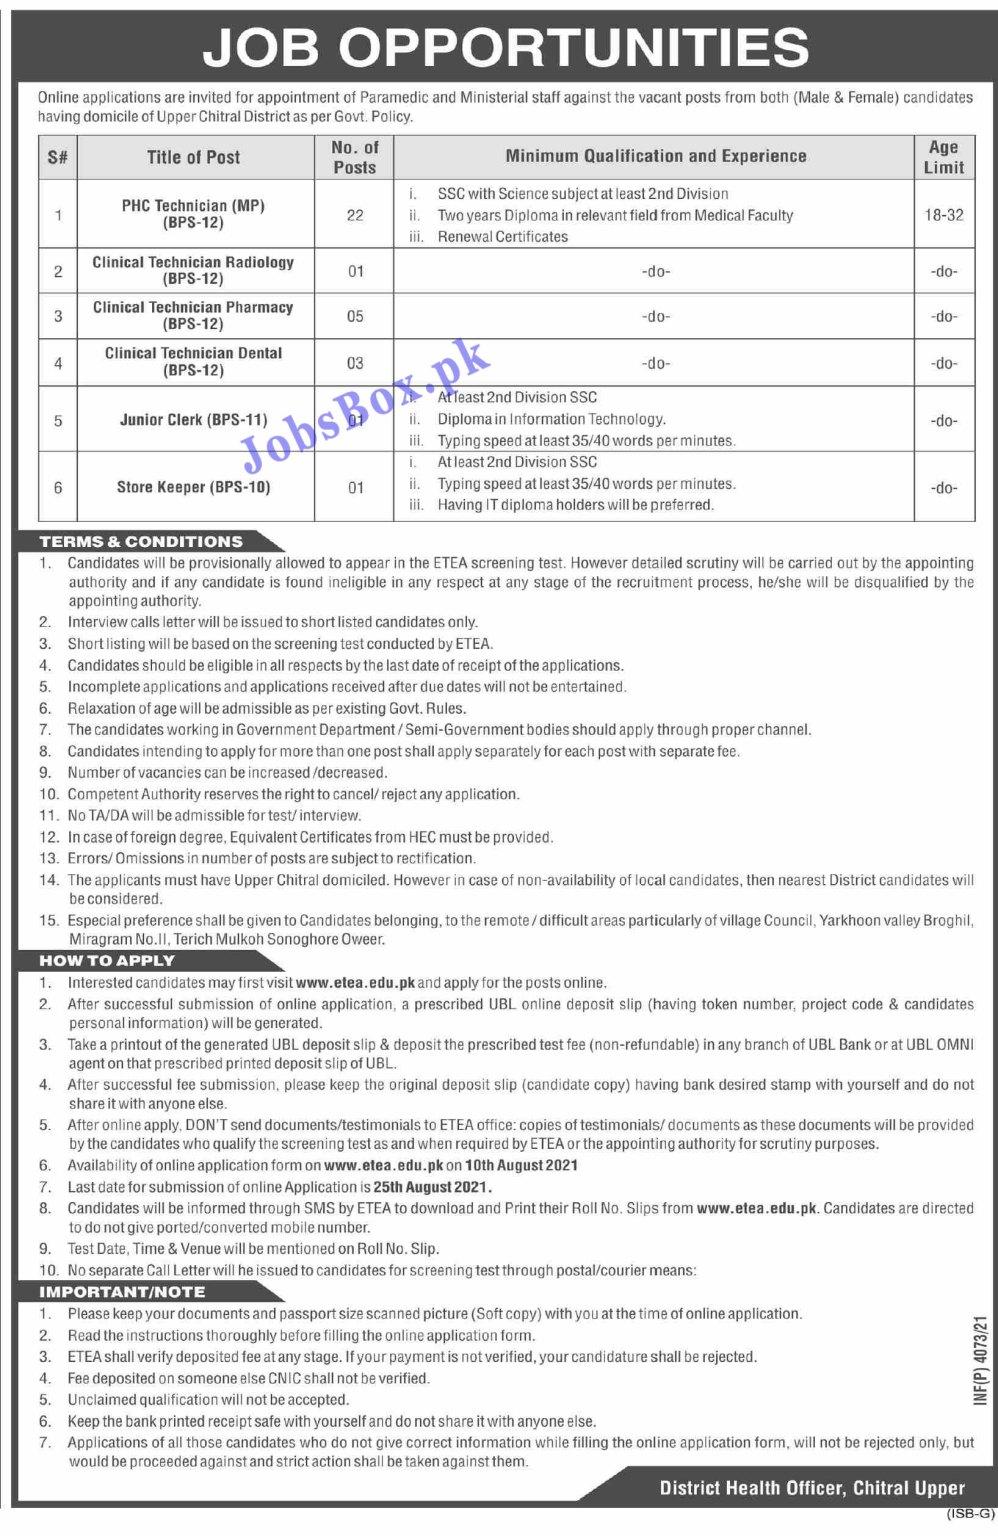 District Health Authority Chitral Jobs 2021 – Apply Online via ETEA